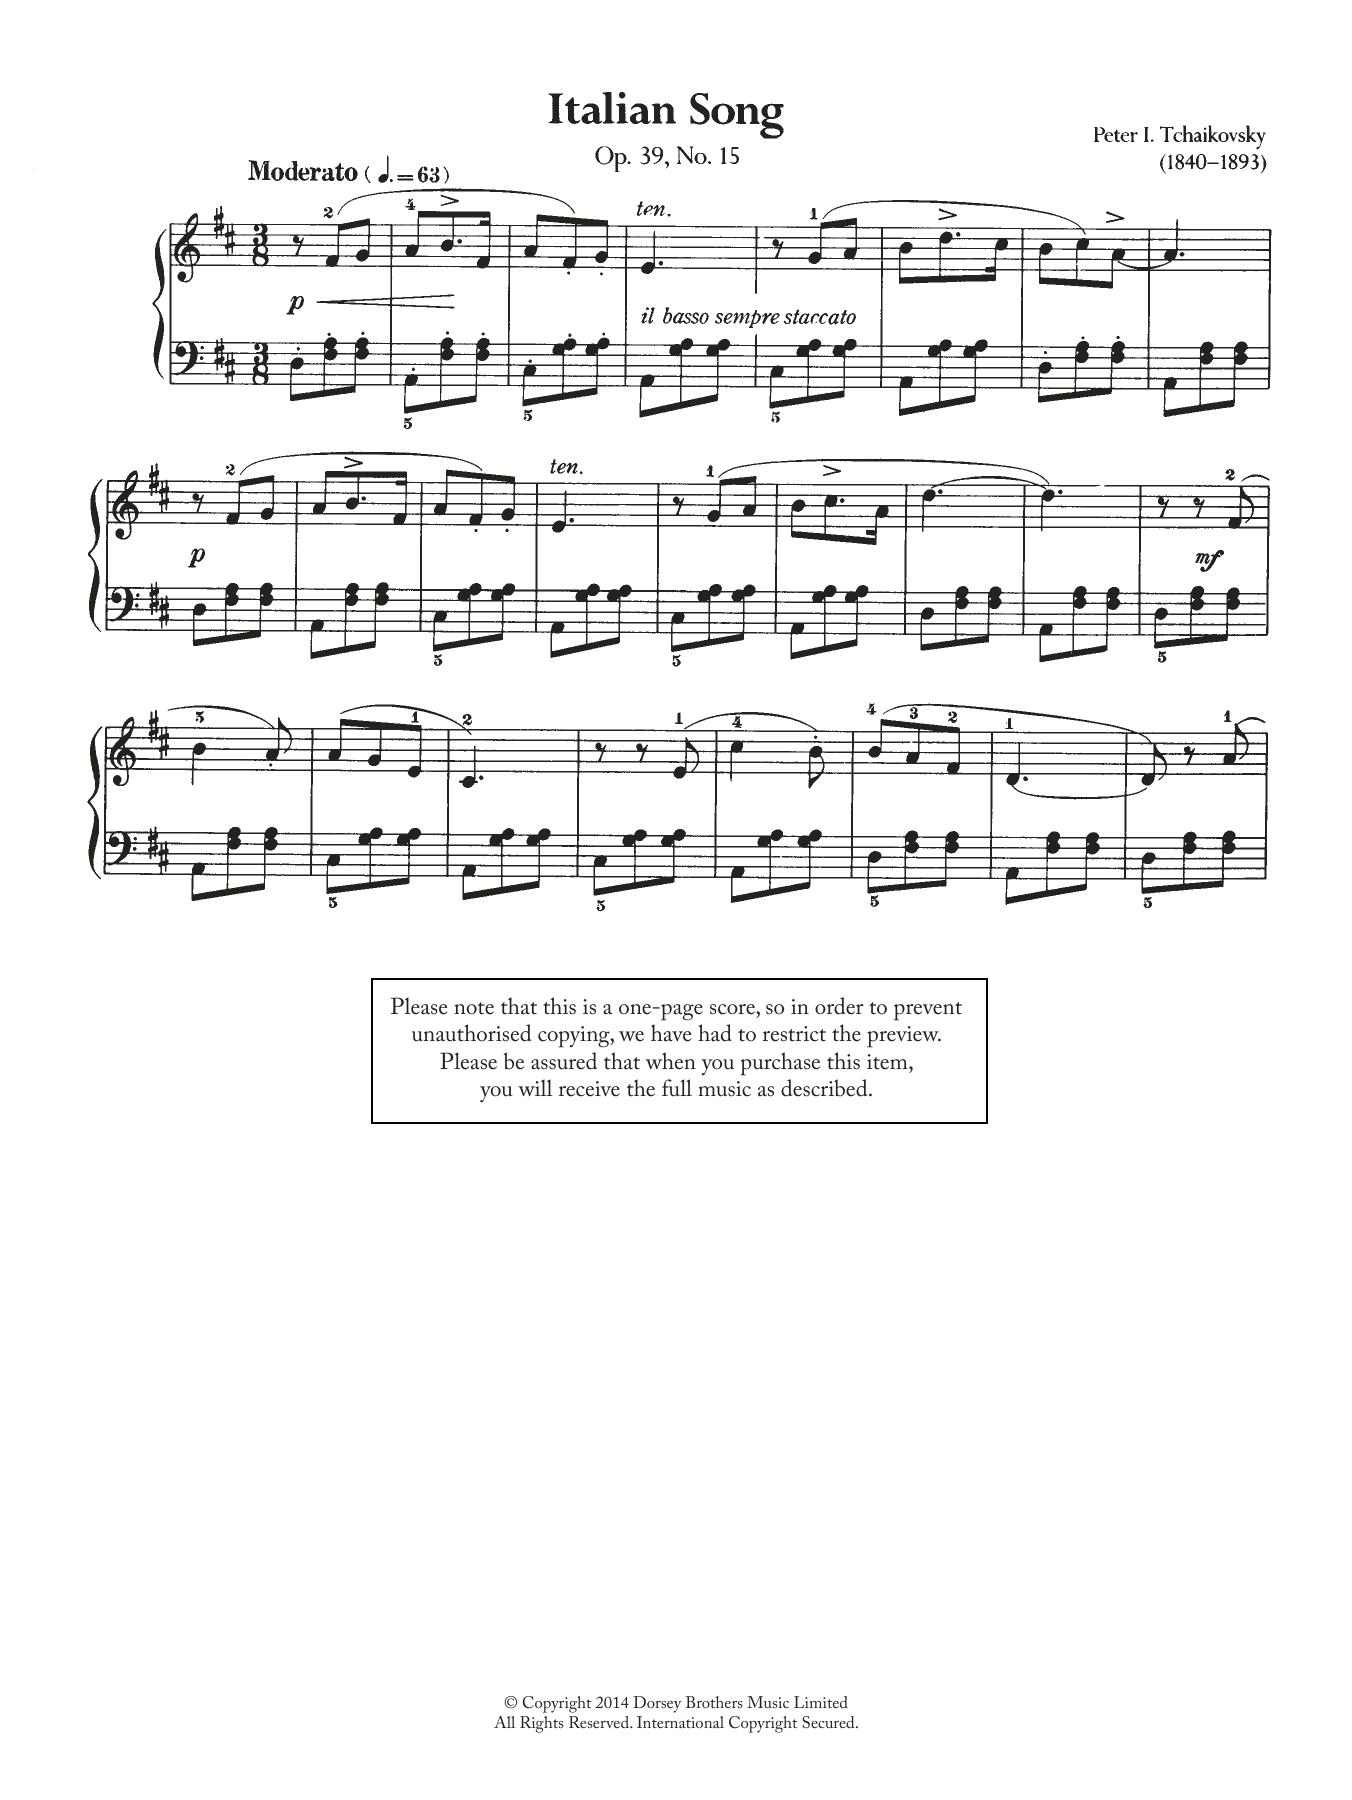 Pyotr Ilyich Tchaikovsky - Italian Song, Op.39 No.15